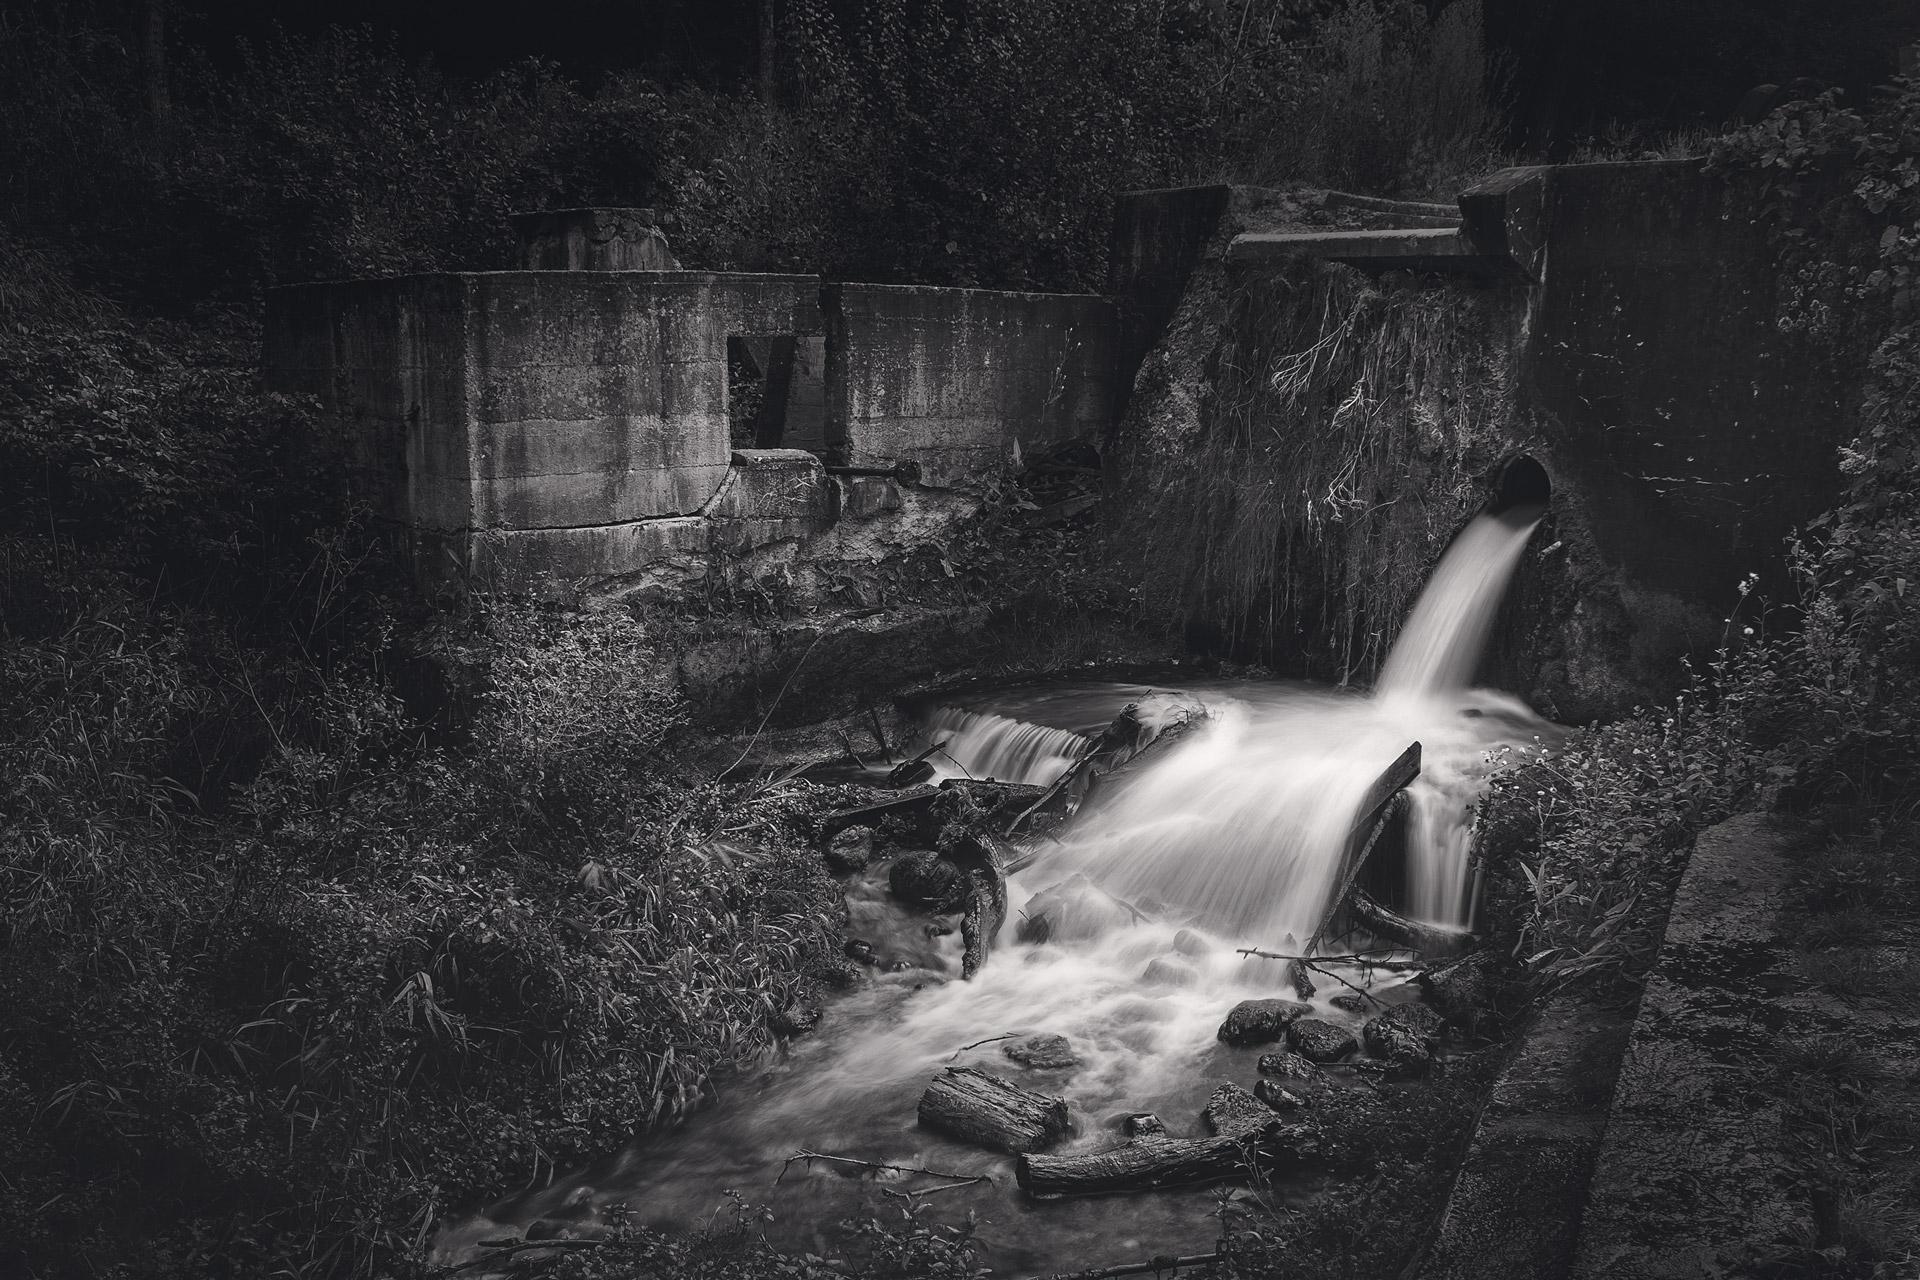 Paradise Springs Dam and Turbine House Ruins